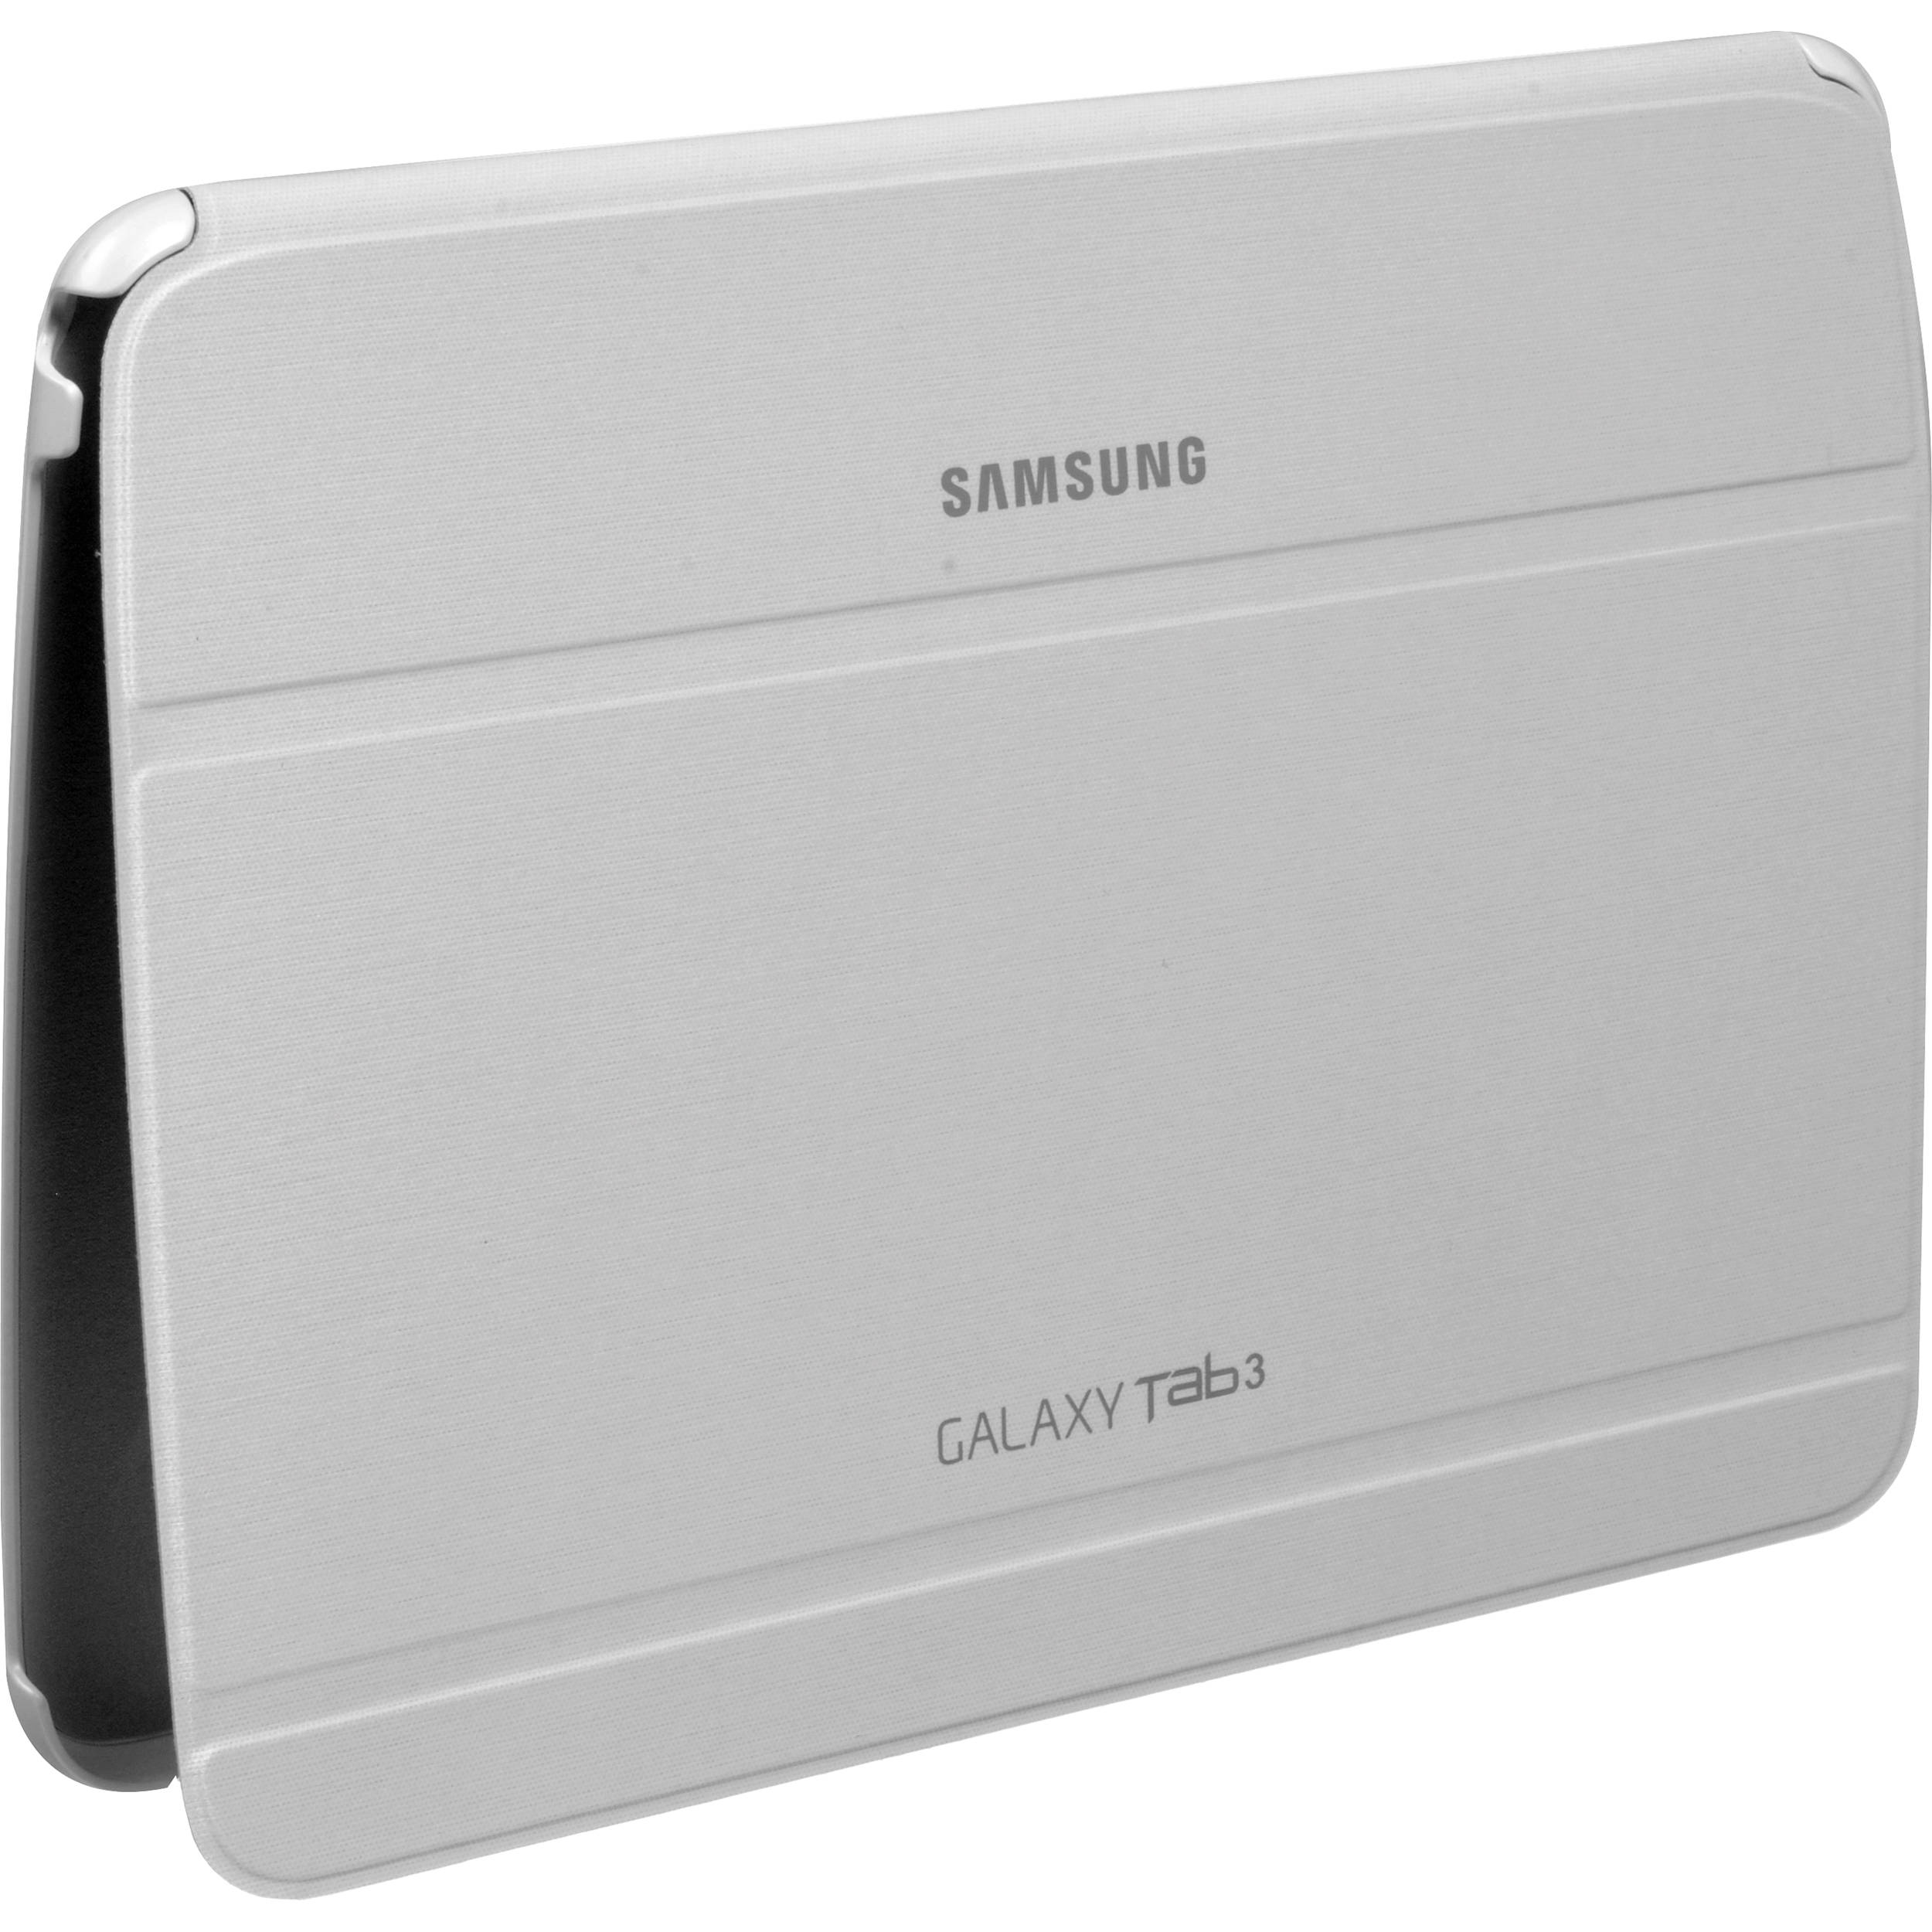 Replacement for Samsung EF-BT520BWEGUJ